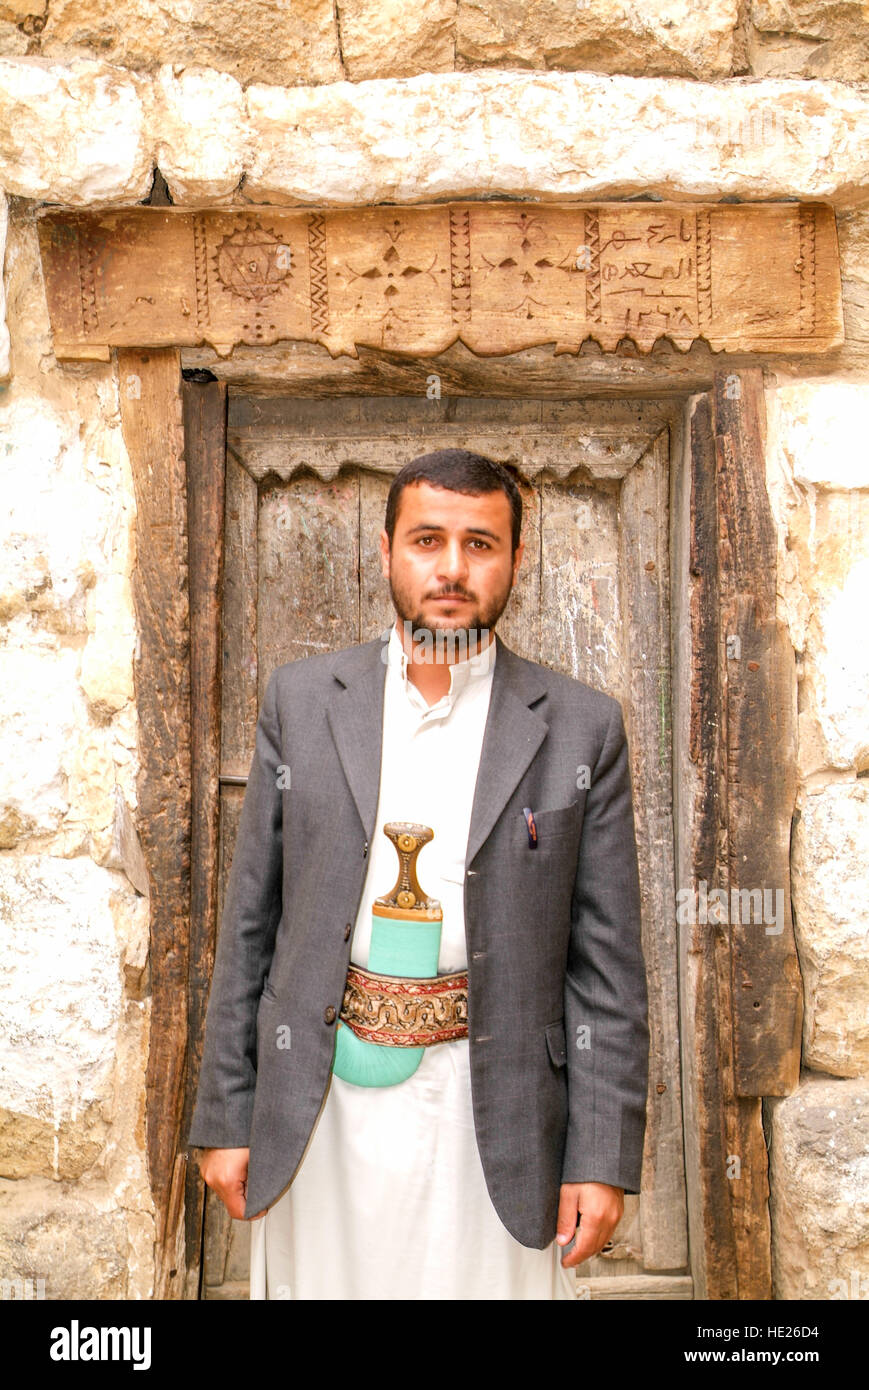 Al Hajjarah, Yemen - 7 january 2016: man posing in front of an old jew door of a house at the village of Al Hajjarah - Stock Image